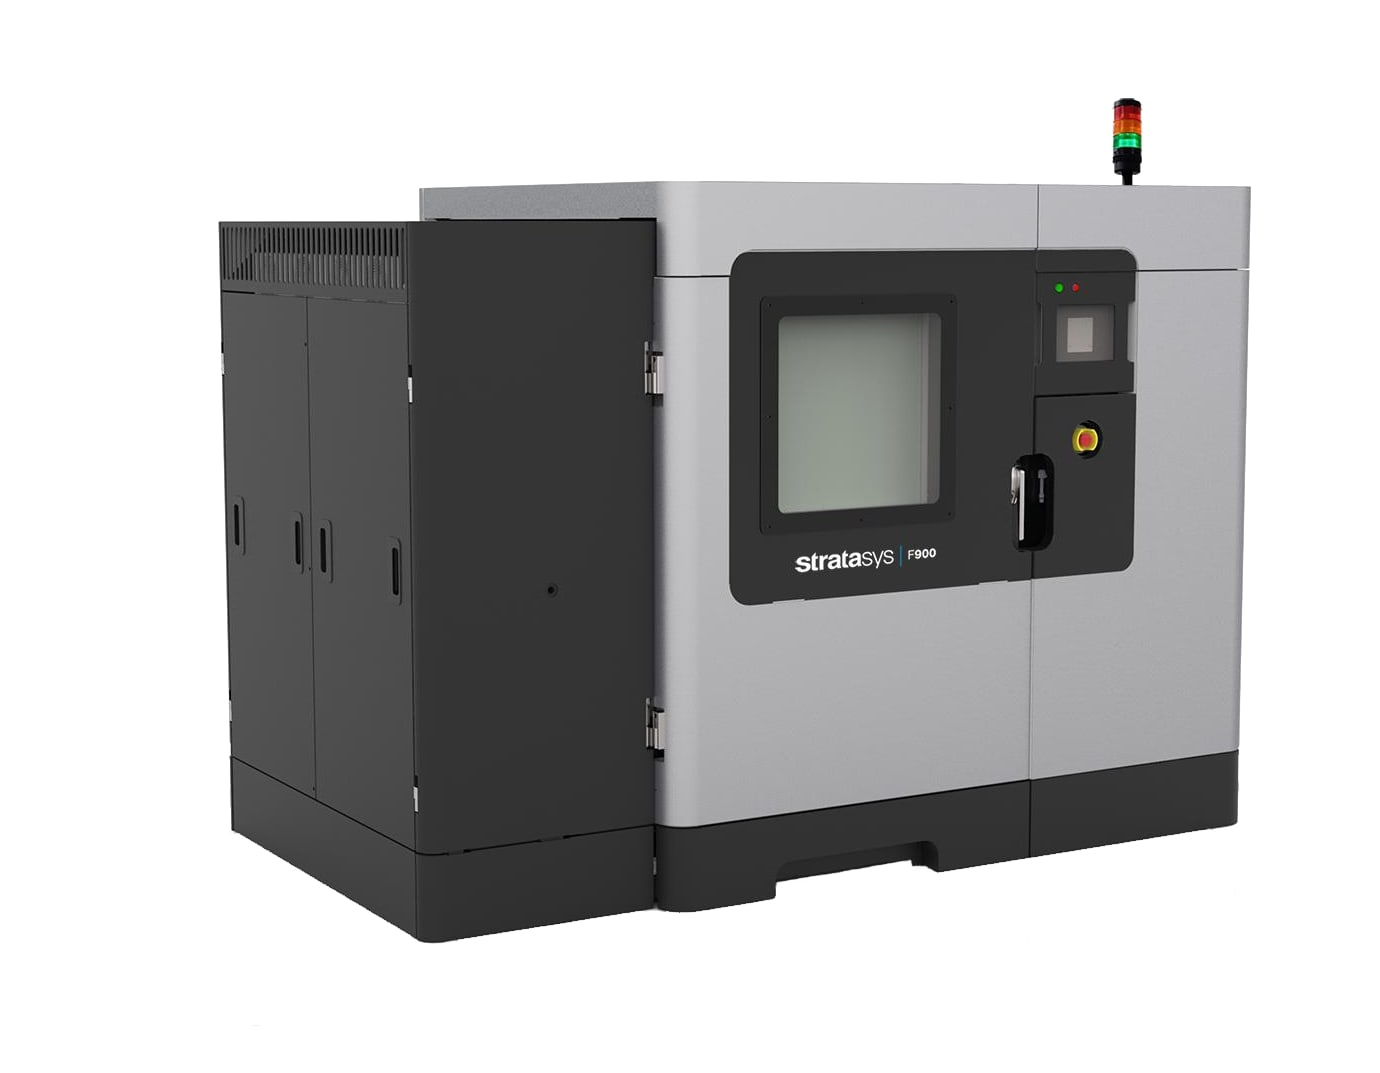 3D-Drucker: Stratasys F900